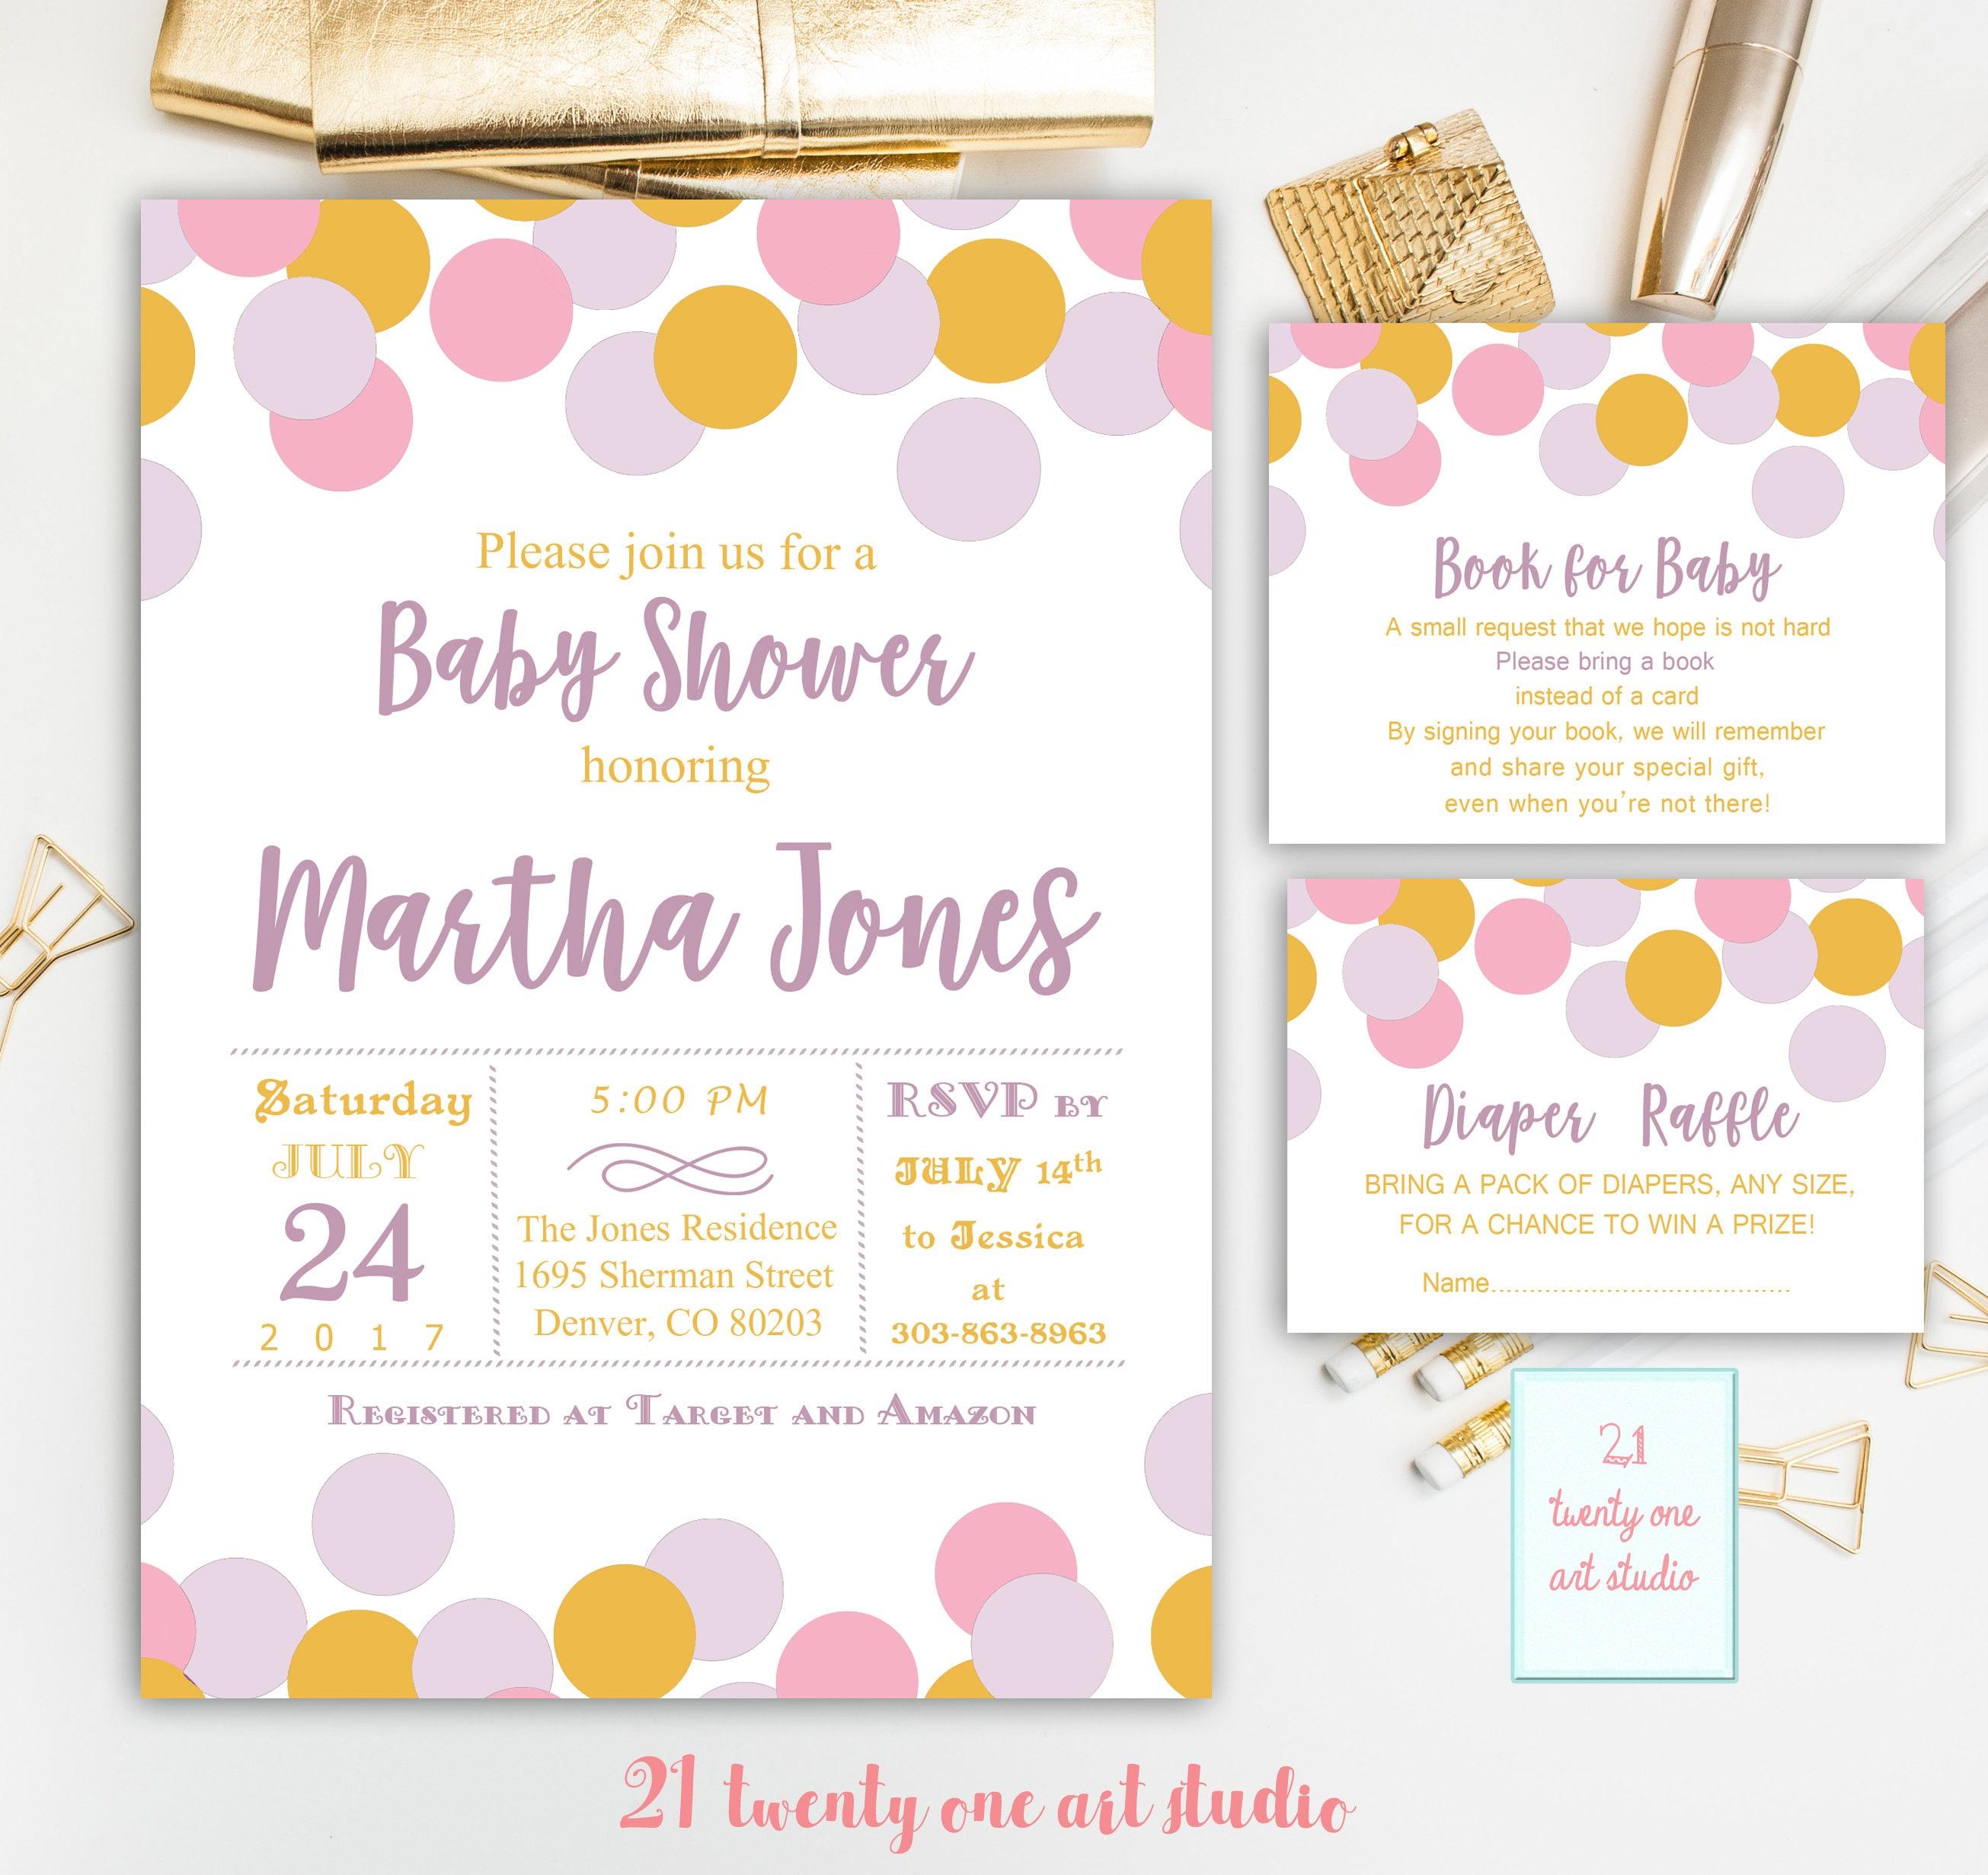 s invitations safari shower bunny floral party theme invitation jungle pin invite it a baby elephant